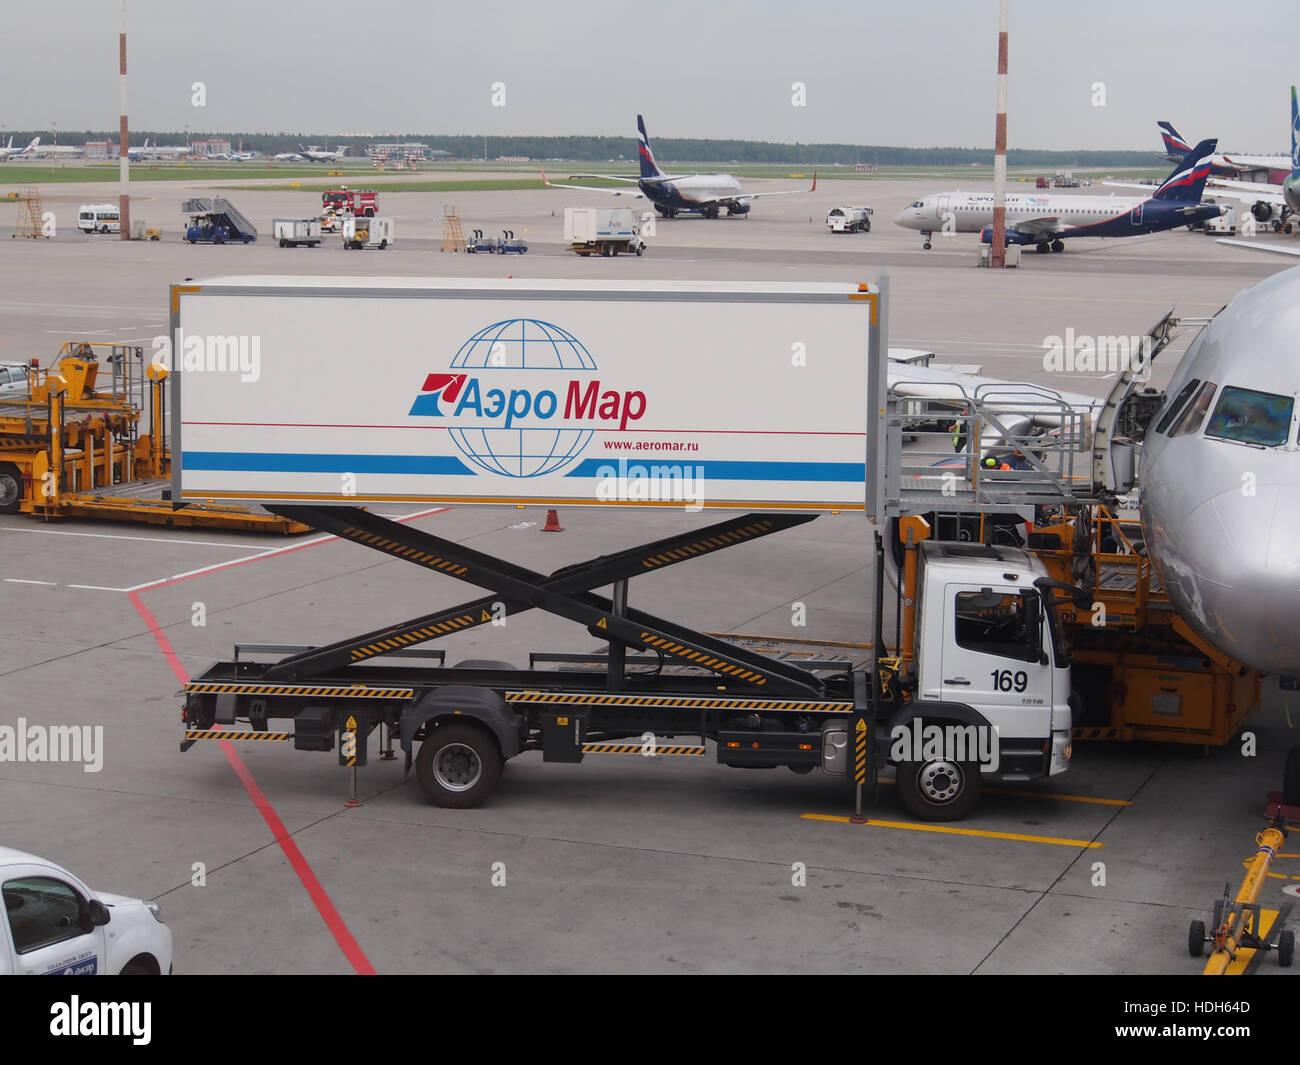 Supply vehicle at Sheremetyevo International Airport pic1 - Stock Image